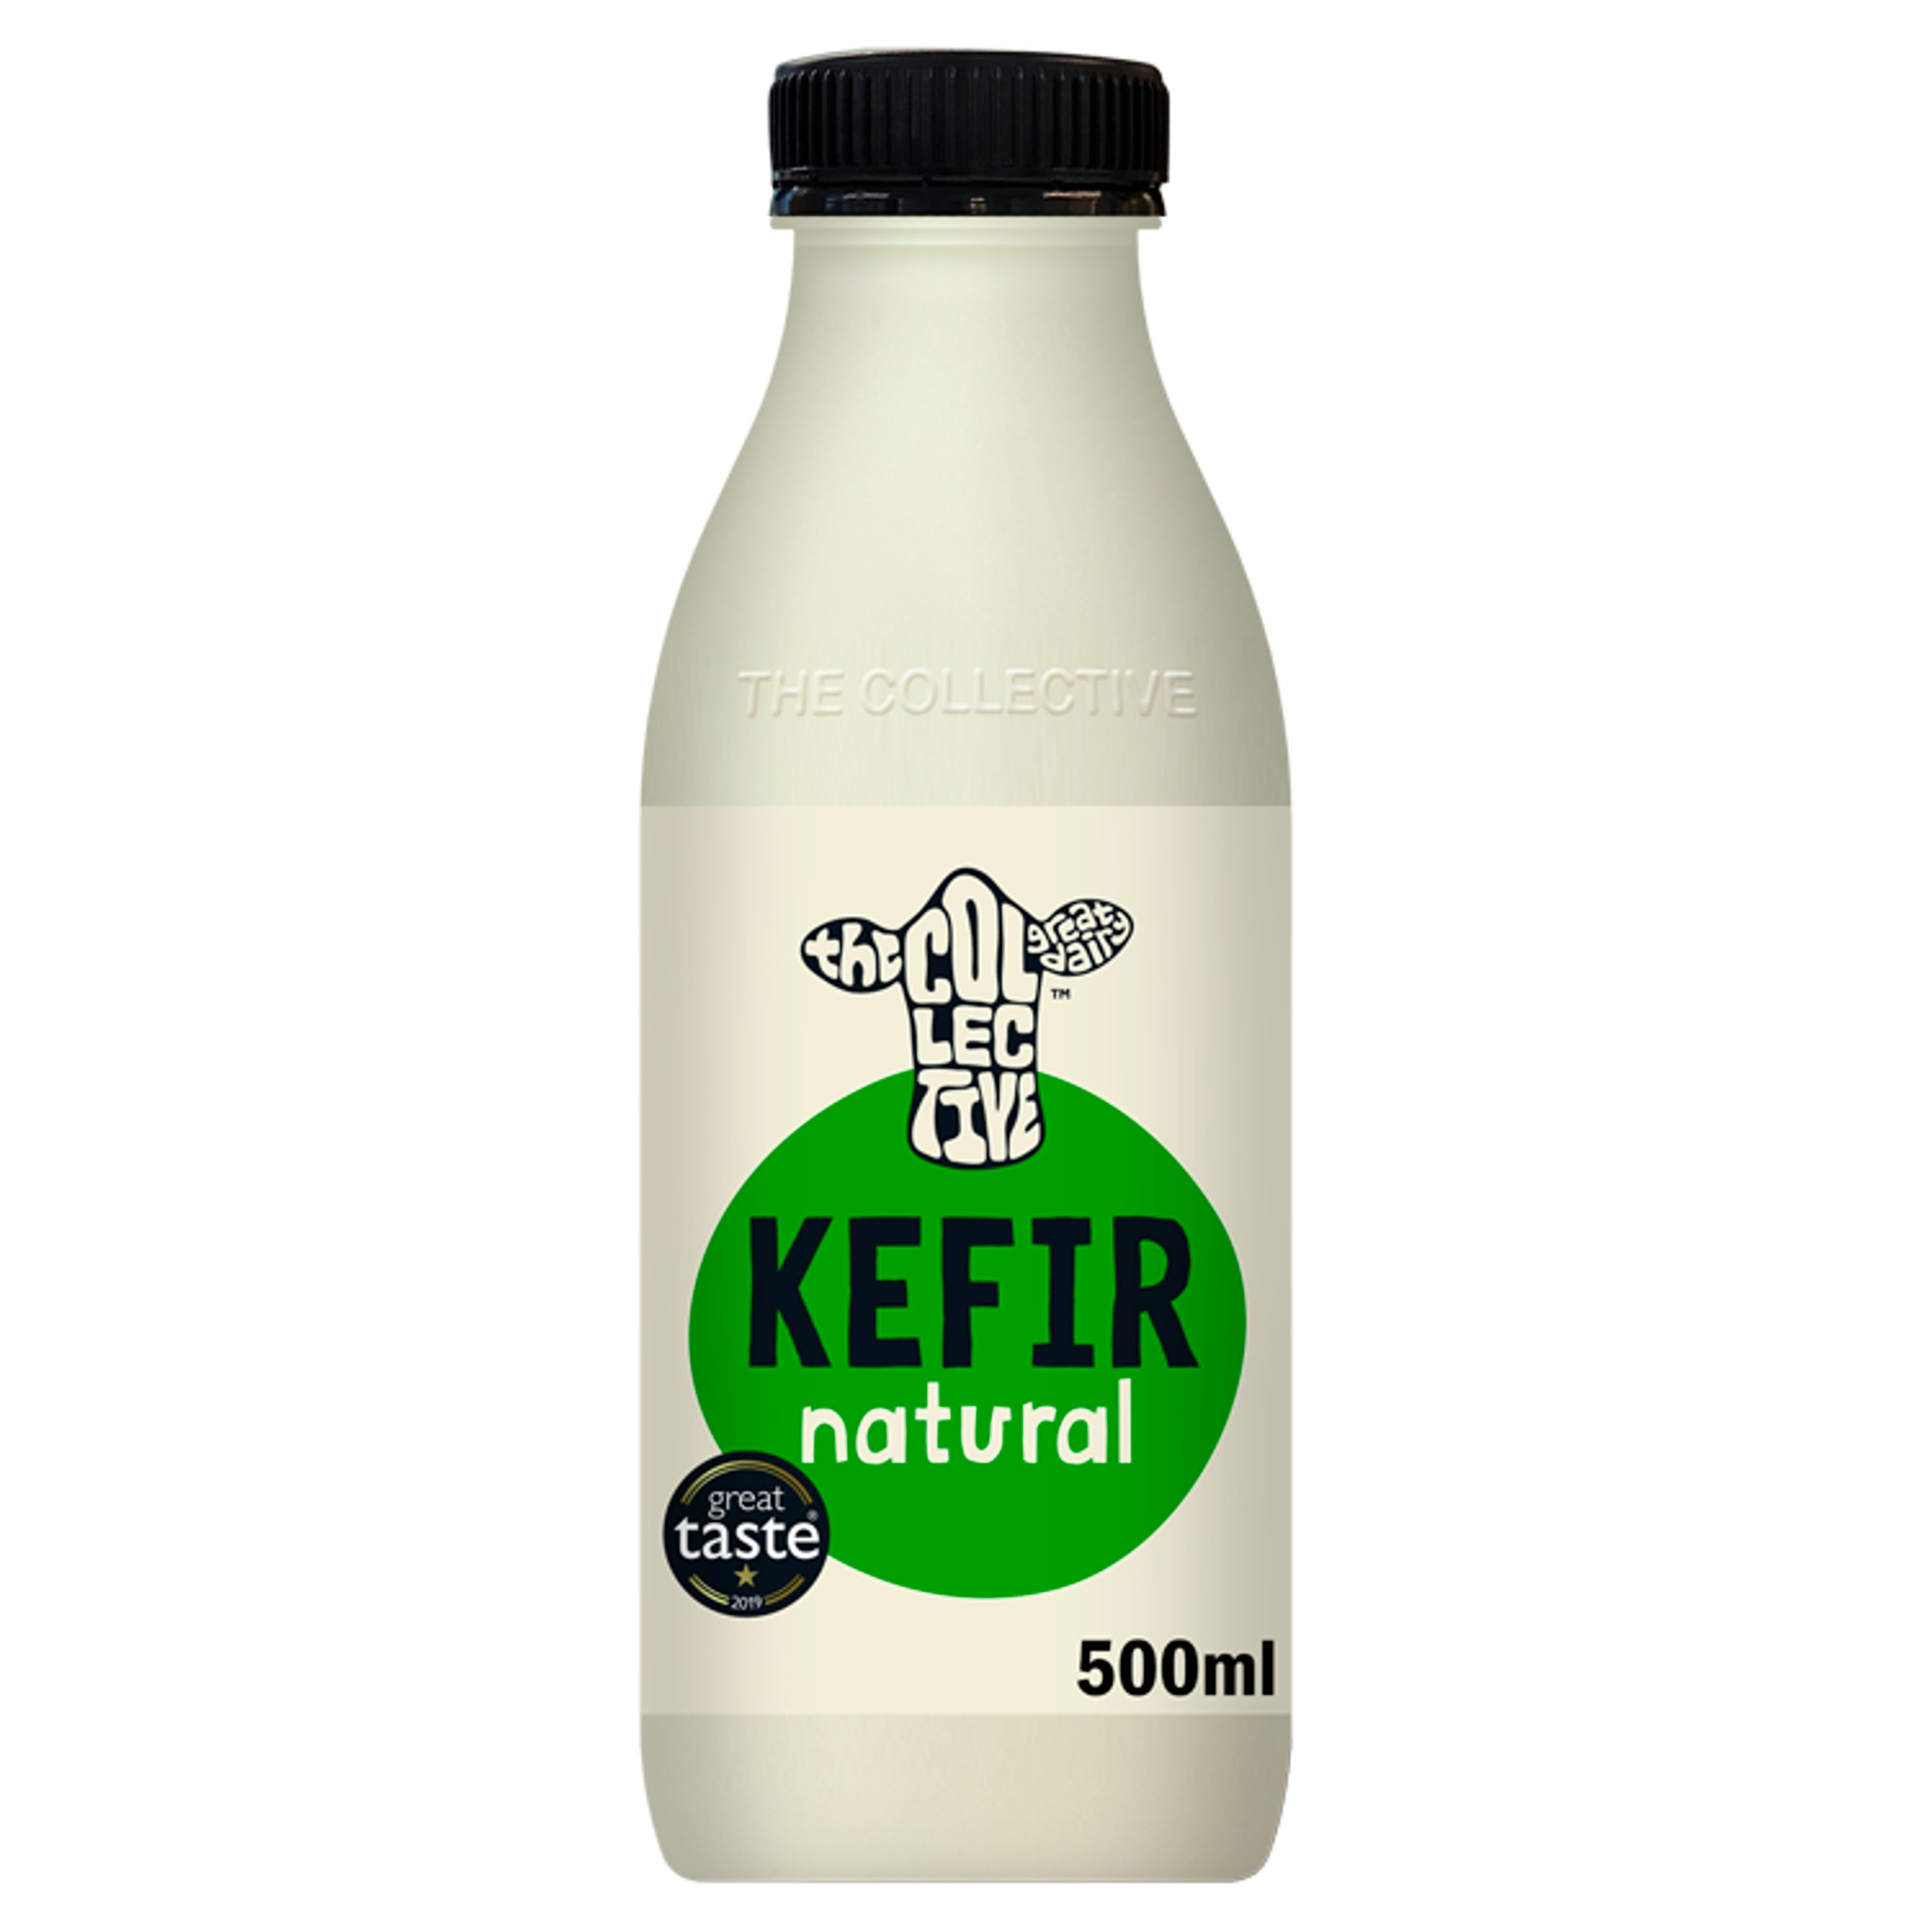 The Collective Kefir Natural Milk Drink 500Ml